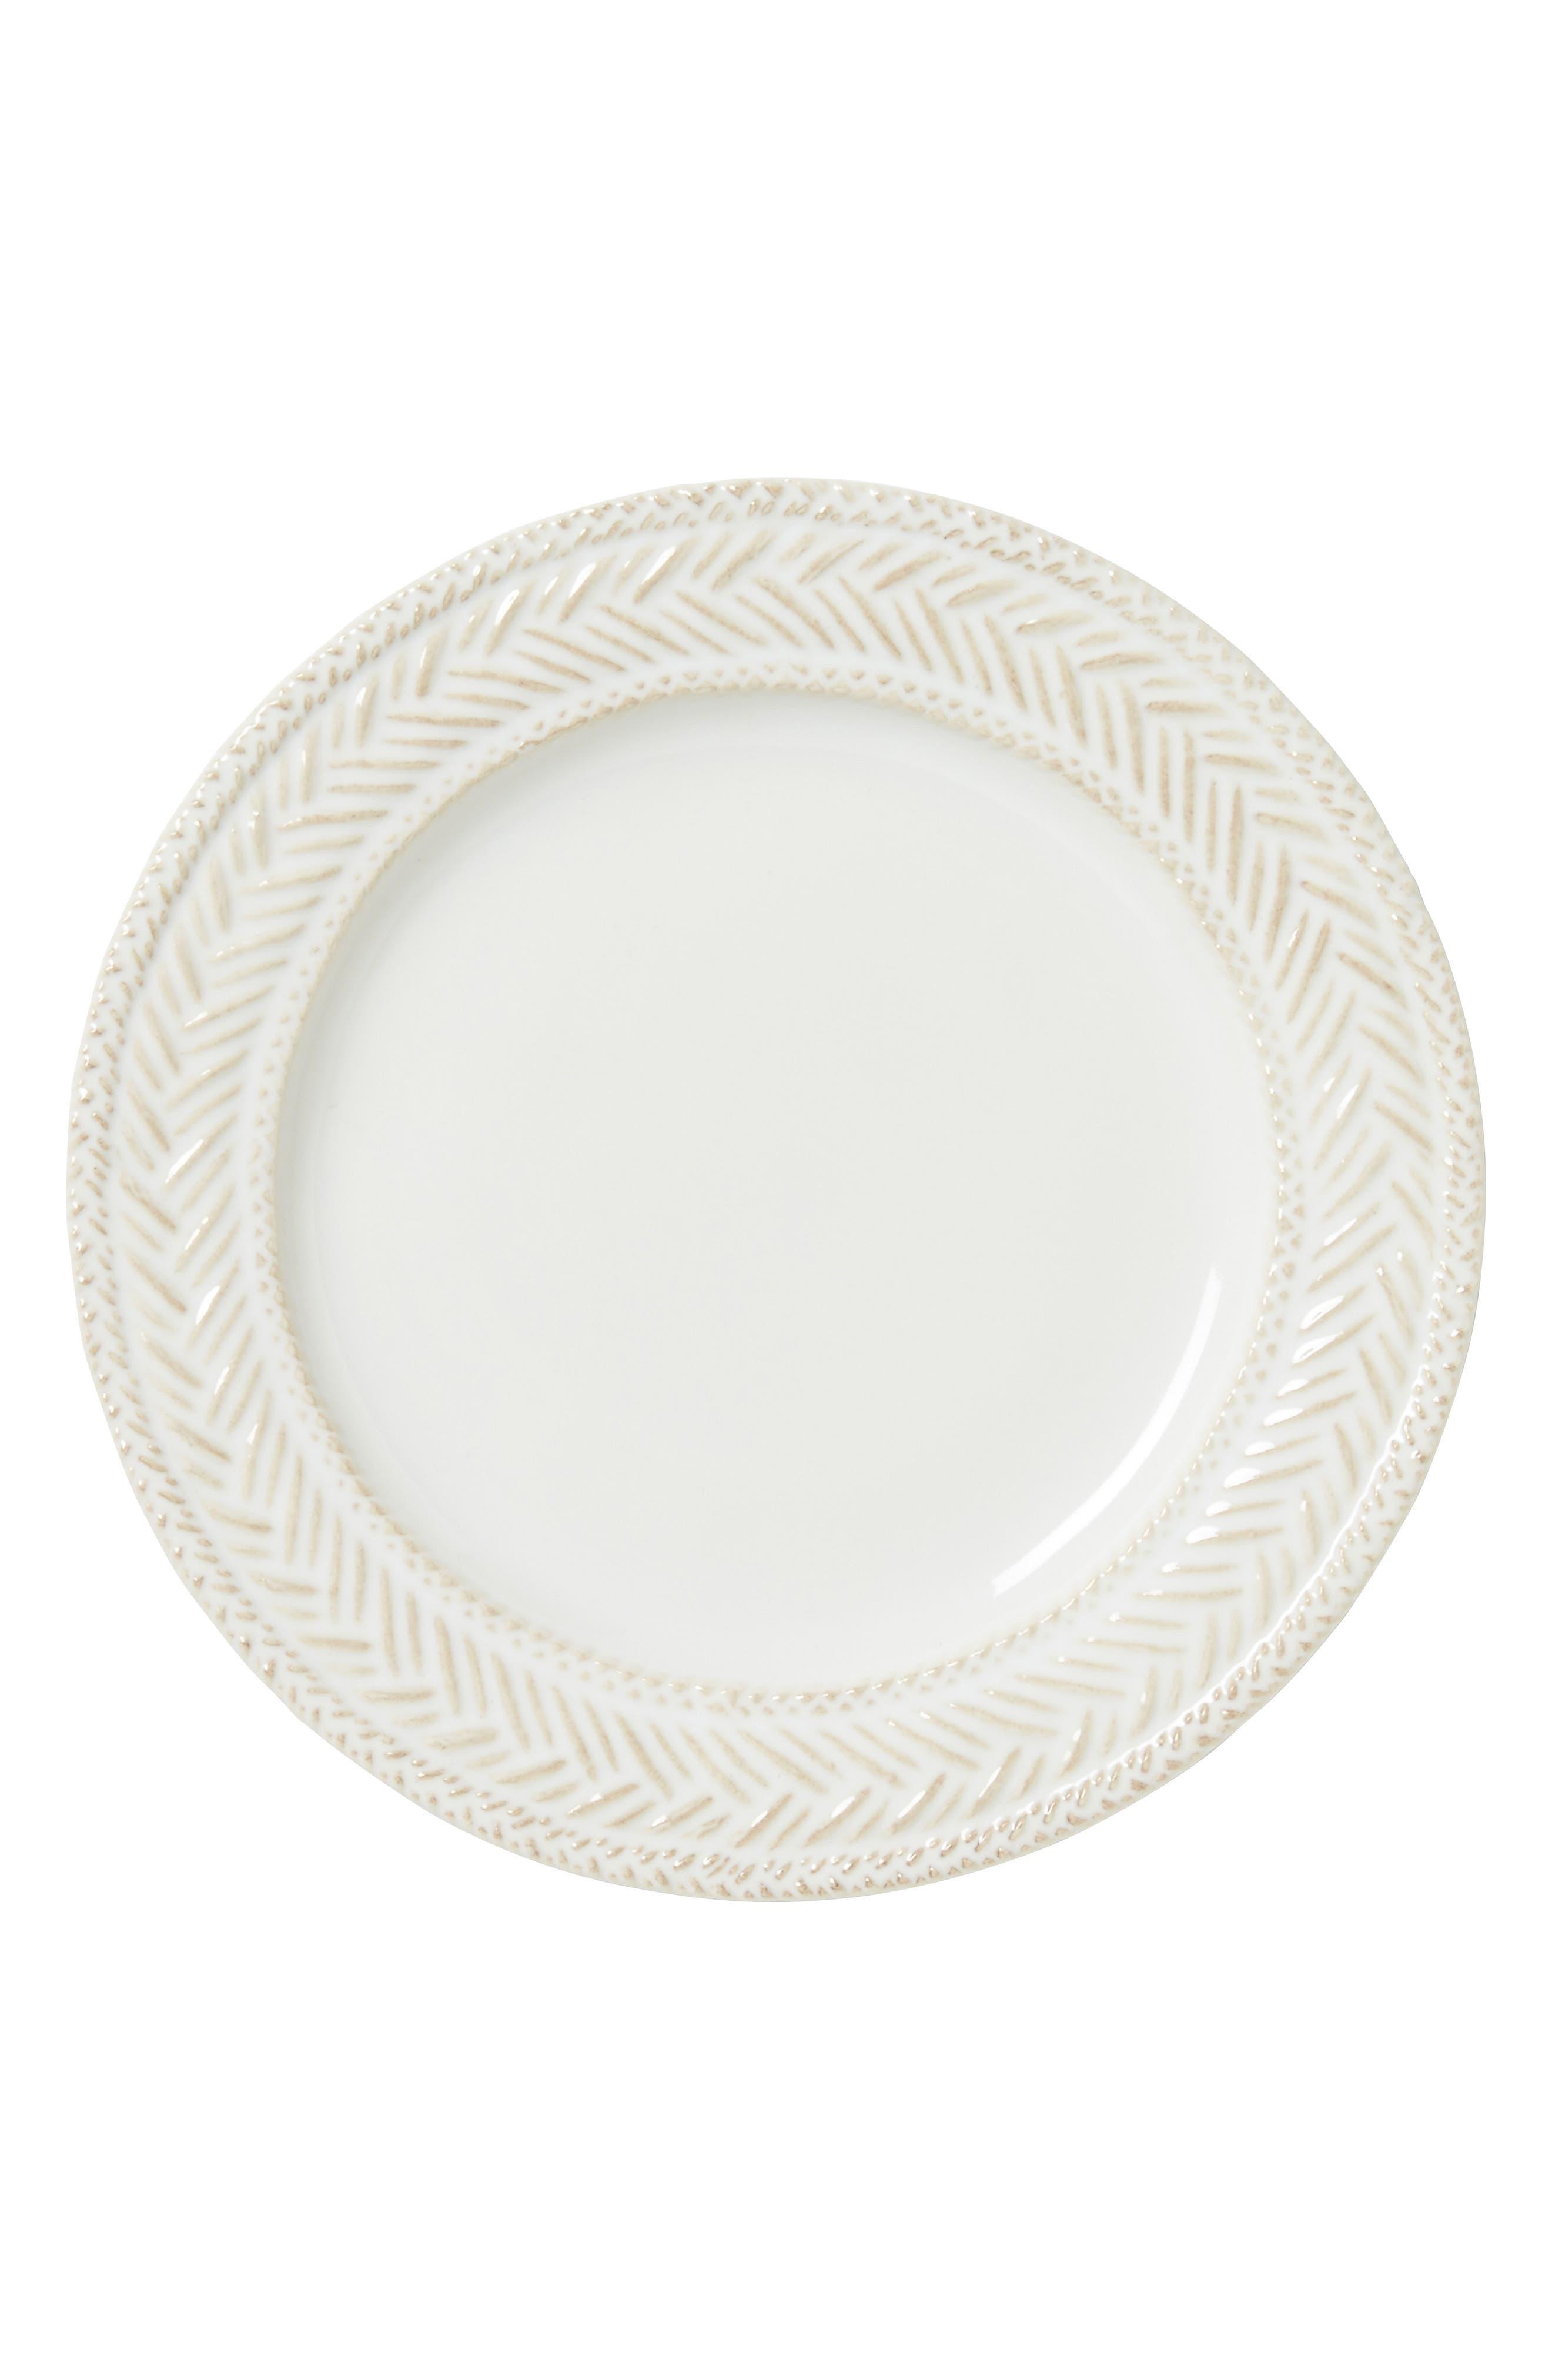 Le Panier Whitewash Side Plate,                         Main,                         color, WHITEWASH